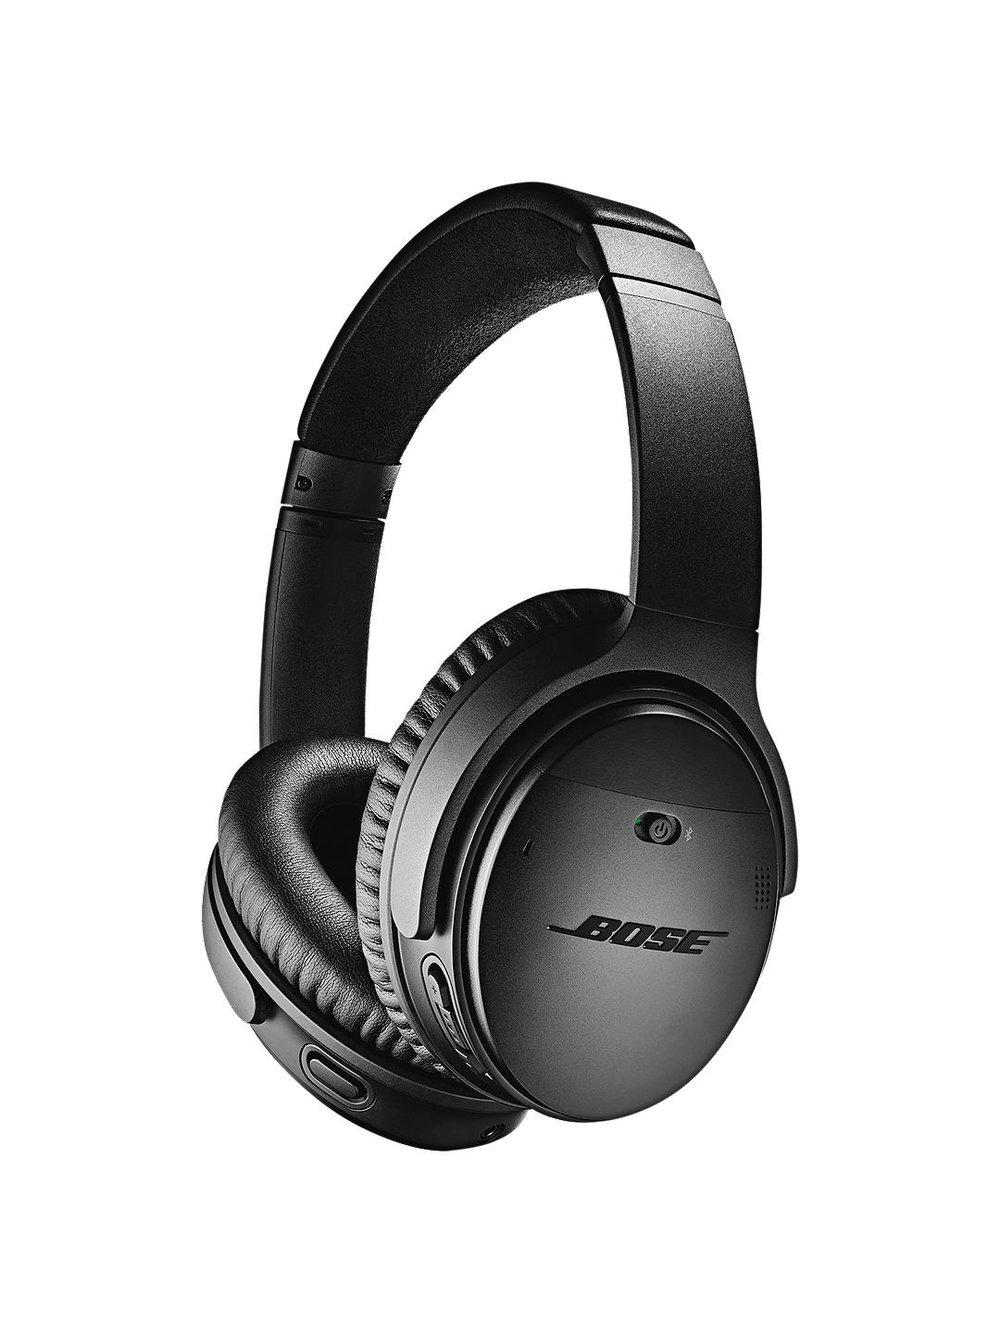 Bose Noise Cancelling Headphones, John Lewis, £289